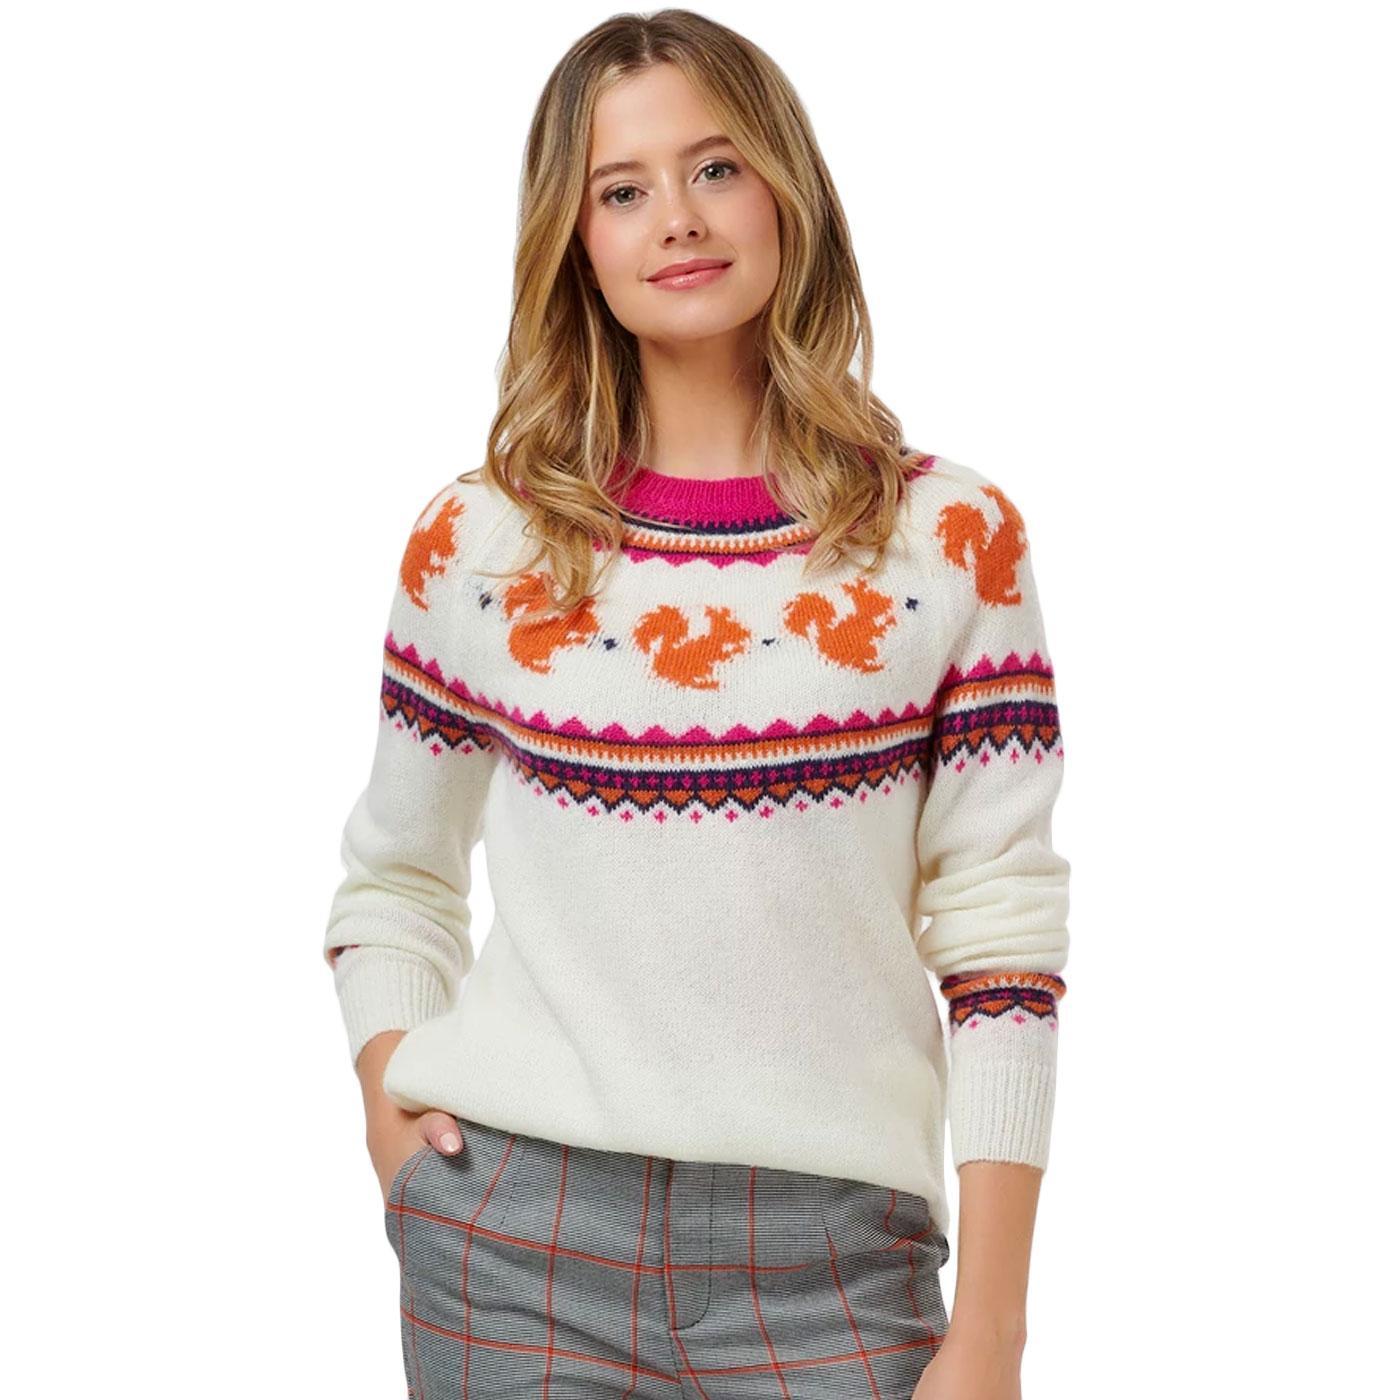 Winnie SUGARHILL BRIGHTON Nuts About You Sweater